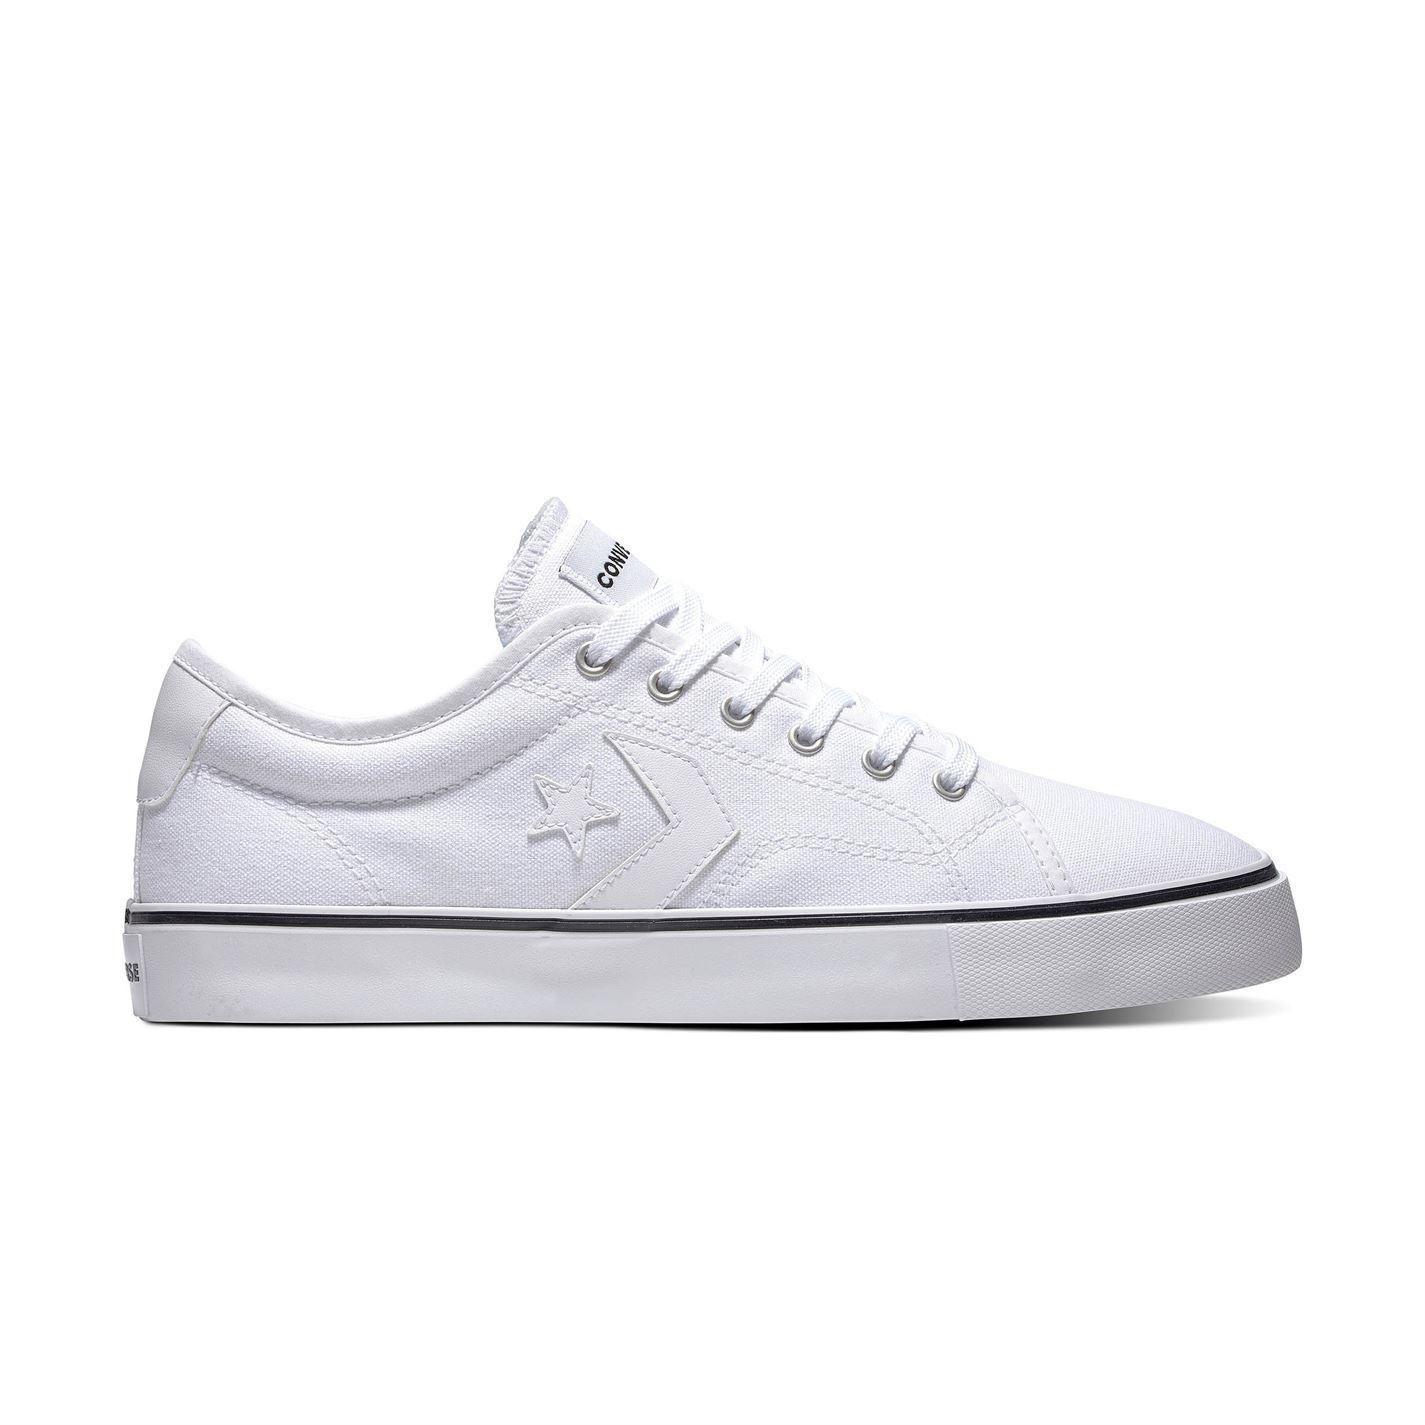 Converse-Ox-REPLAY-Baskets-Pour-Homme-Chaussures-De-Loisirs-Chaussures-Baskets miniature 29